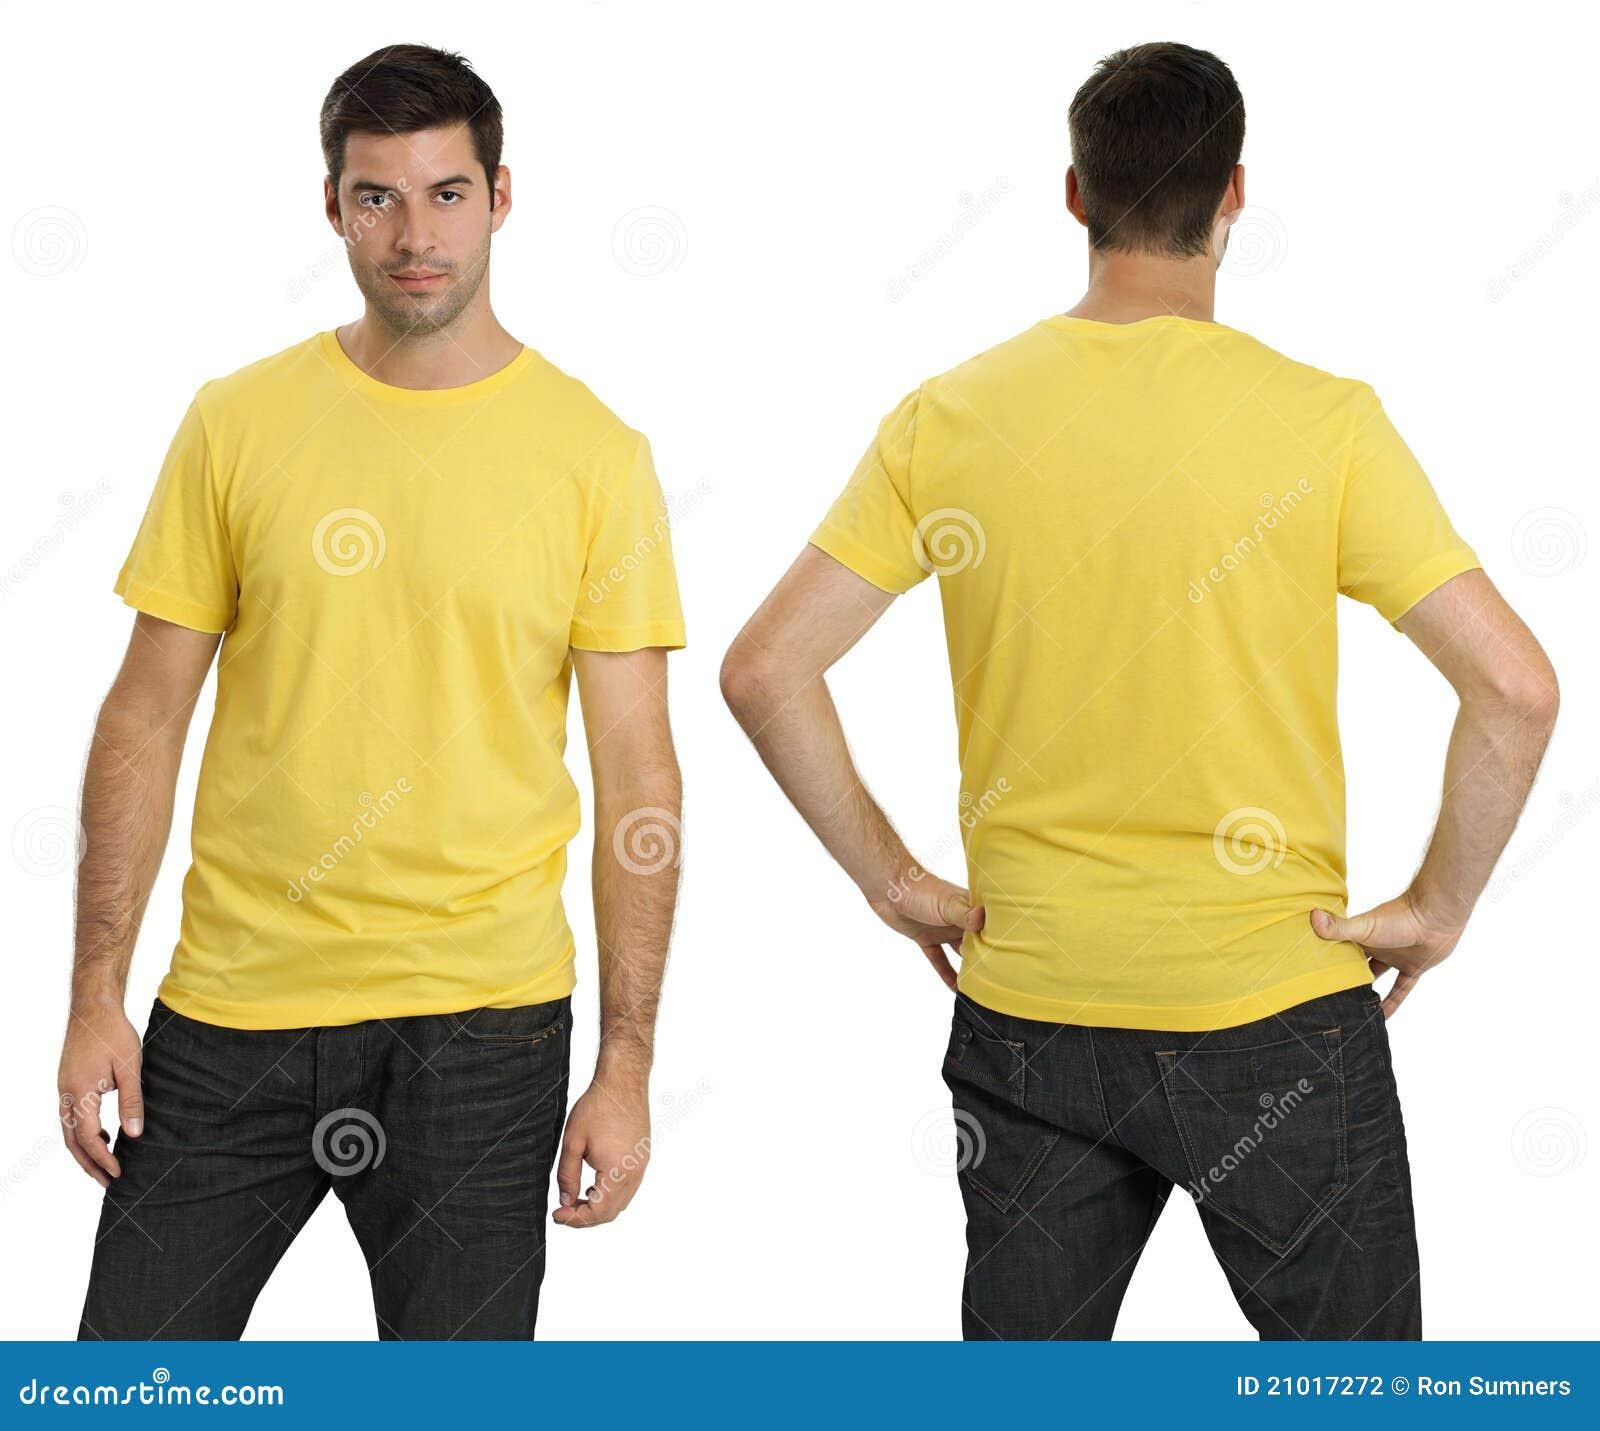 Male Wearing Blank Yellow Shirt Stock Photography - Image: 21017272